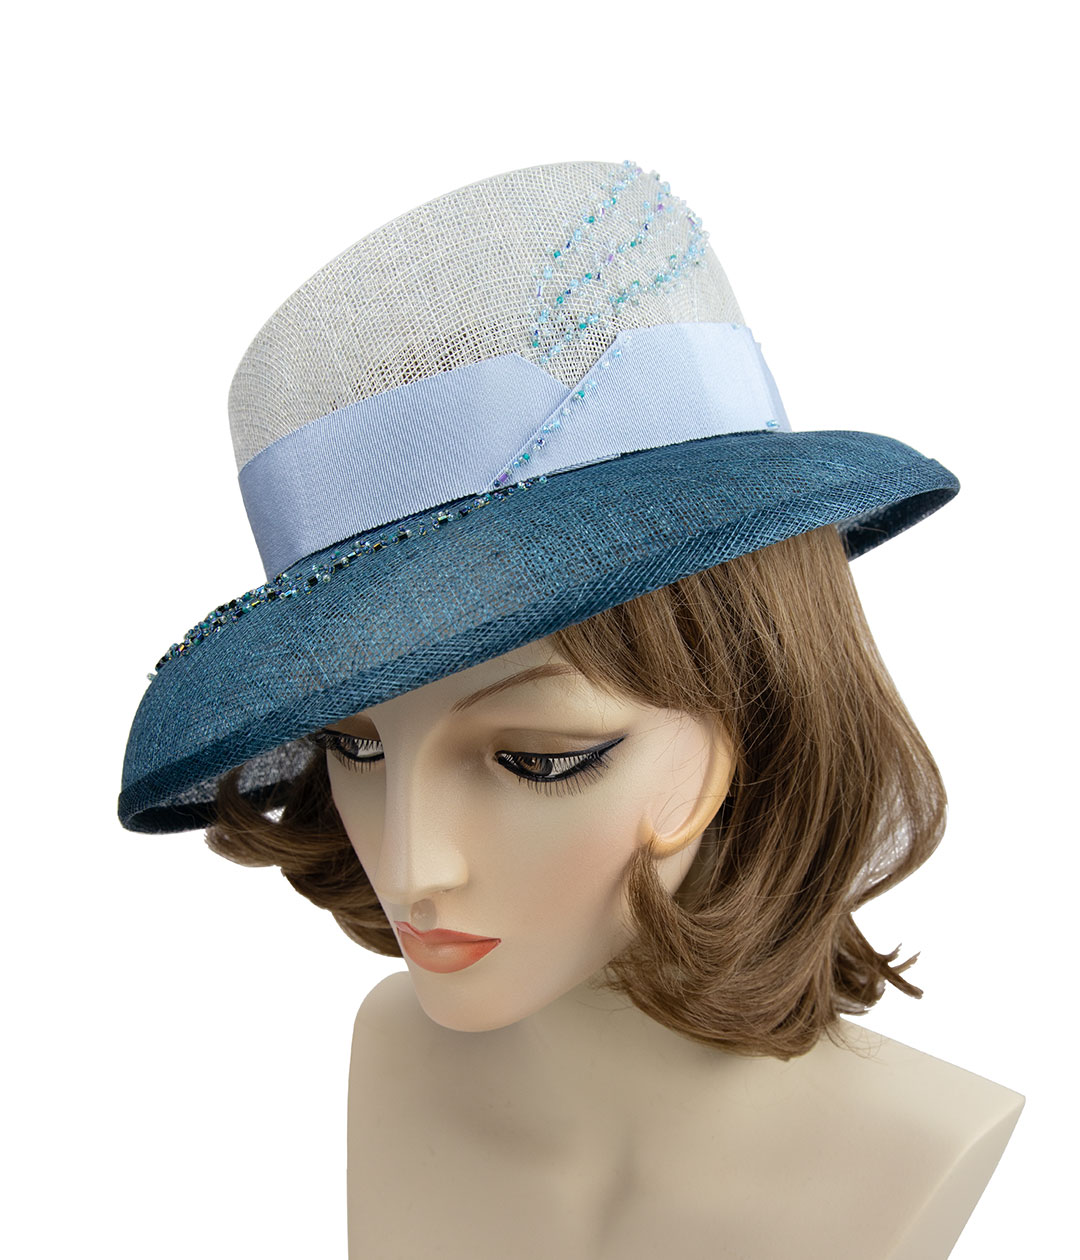 Heavily beaded blue straw hat.